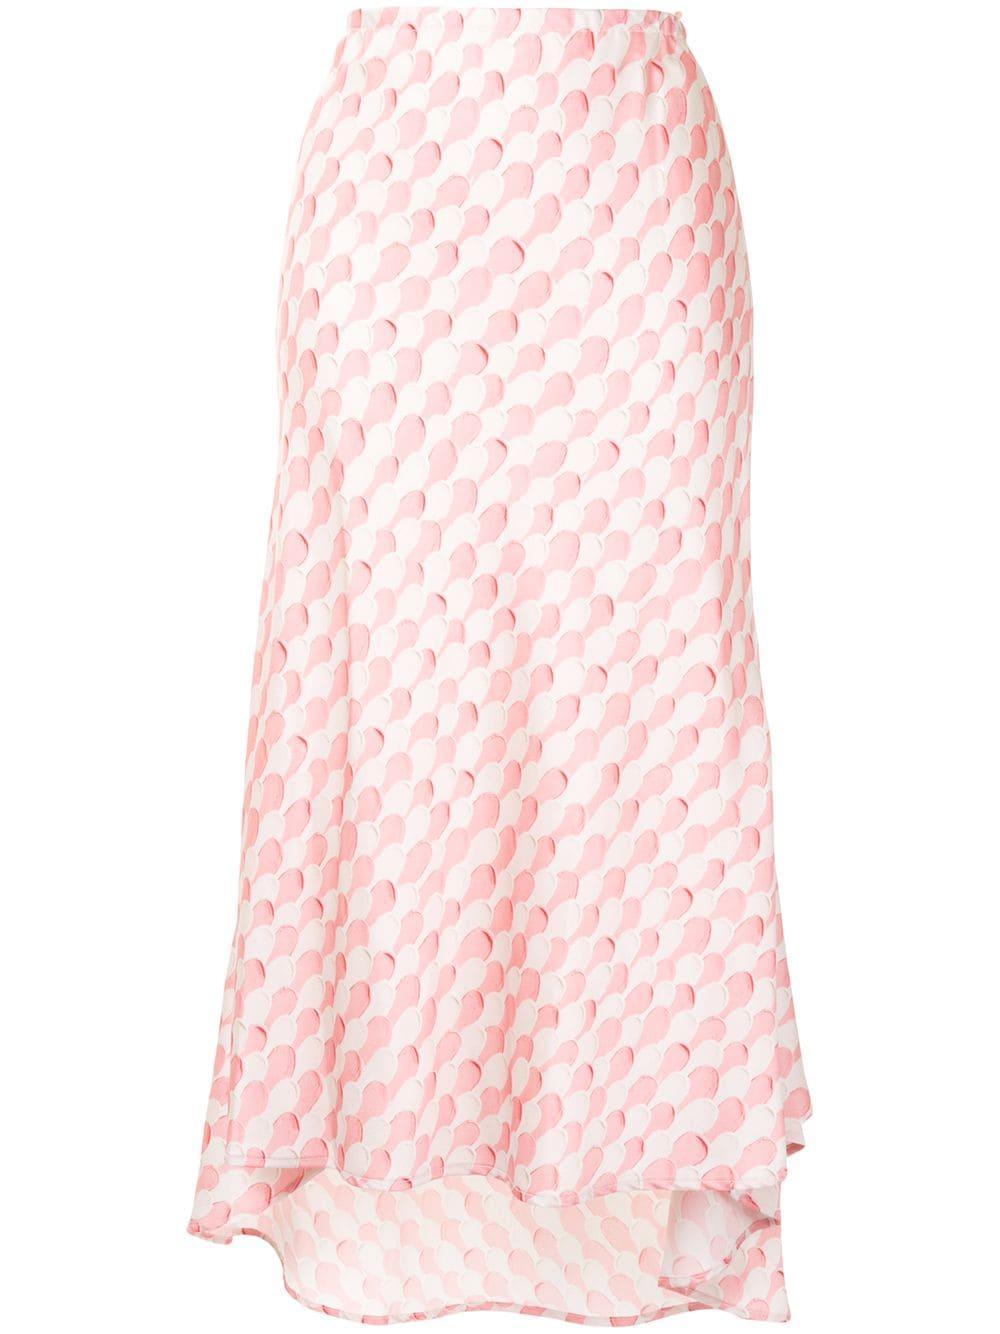 Life After Love Skirt Item # SK-816-343-2